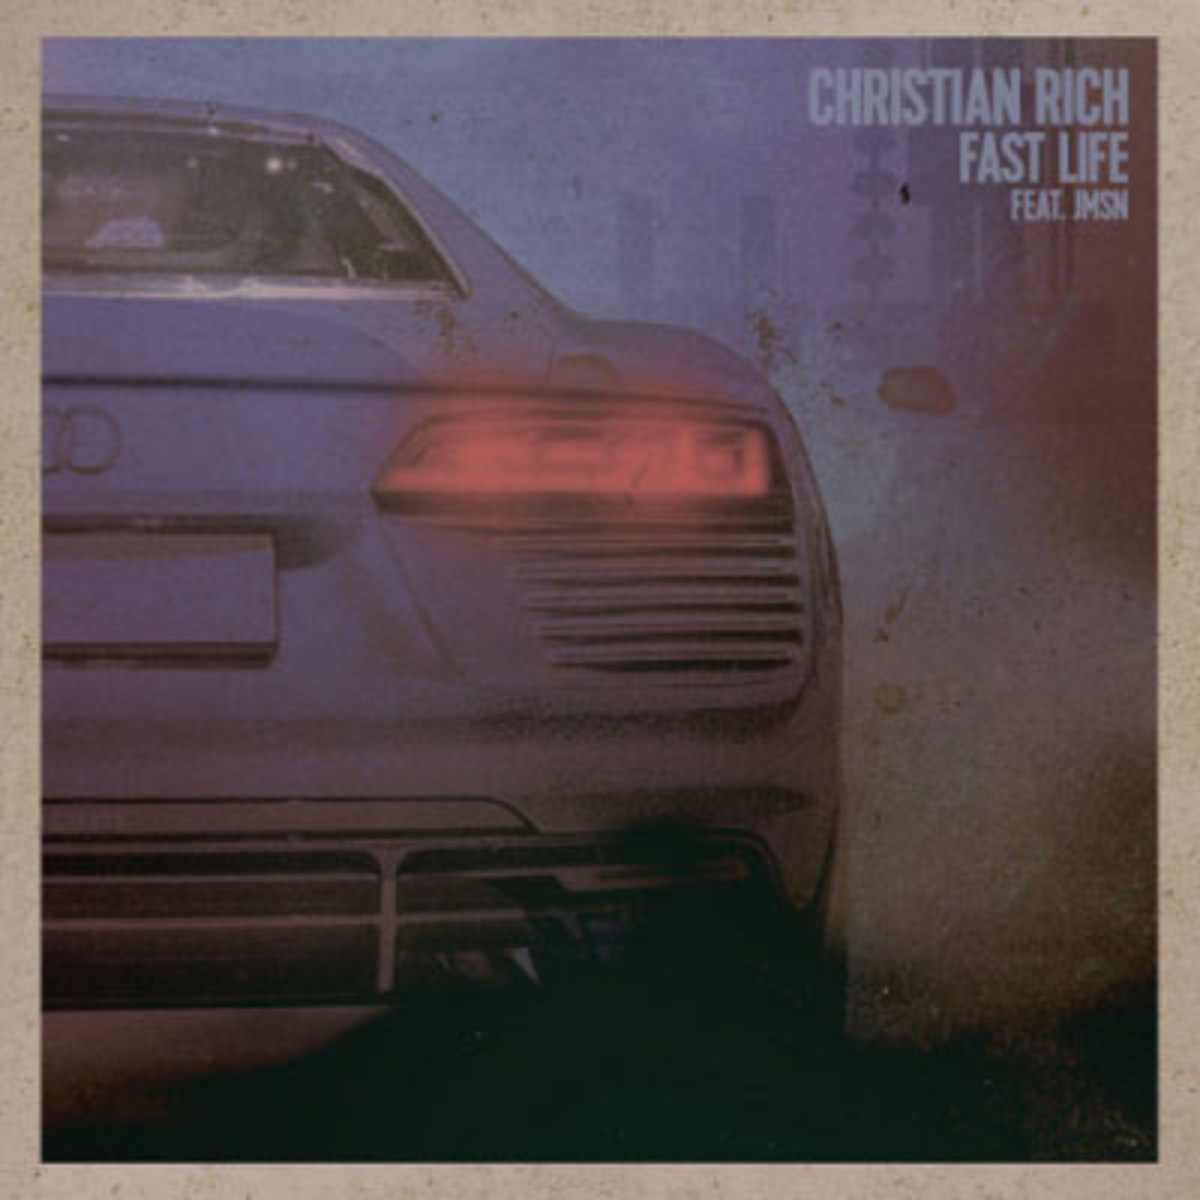 christian-rich-fast-life.jpg